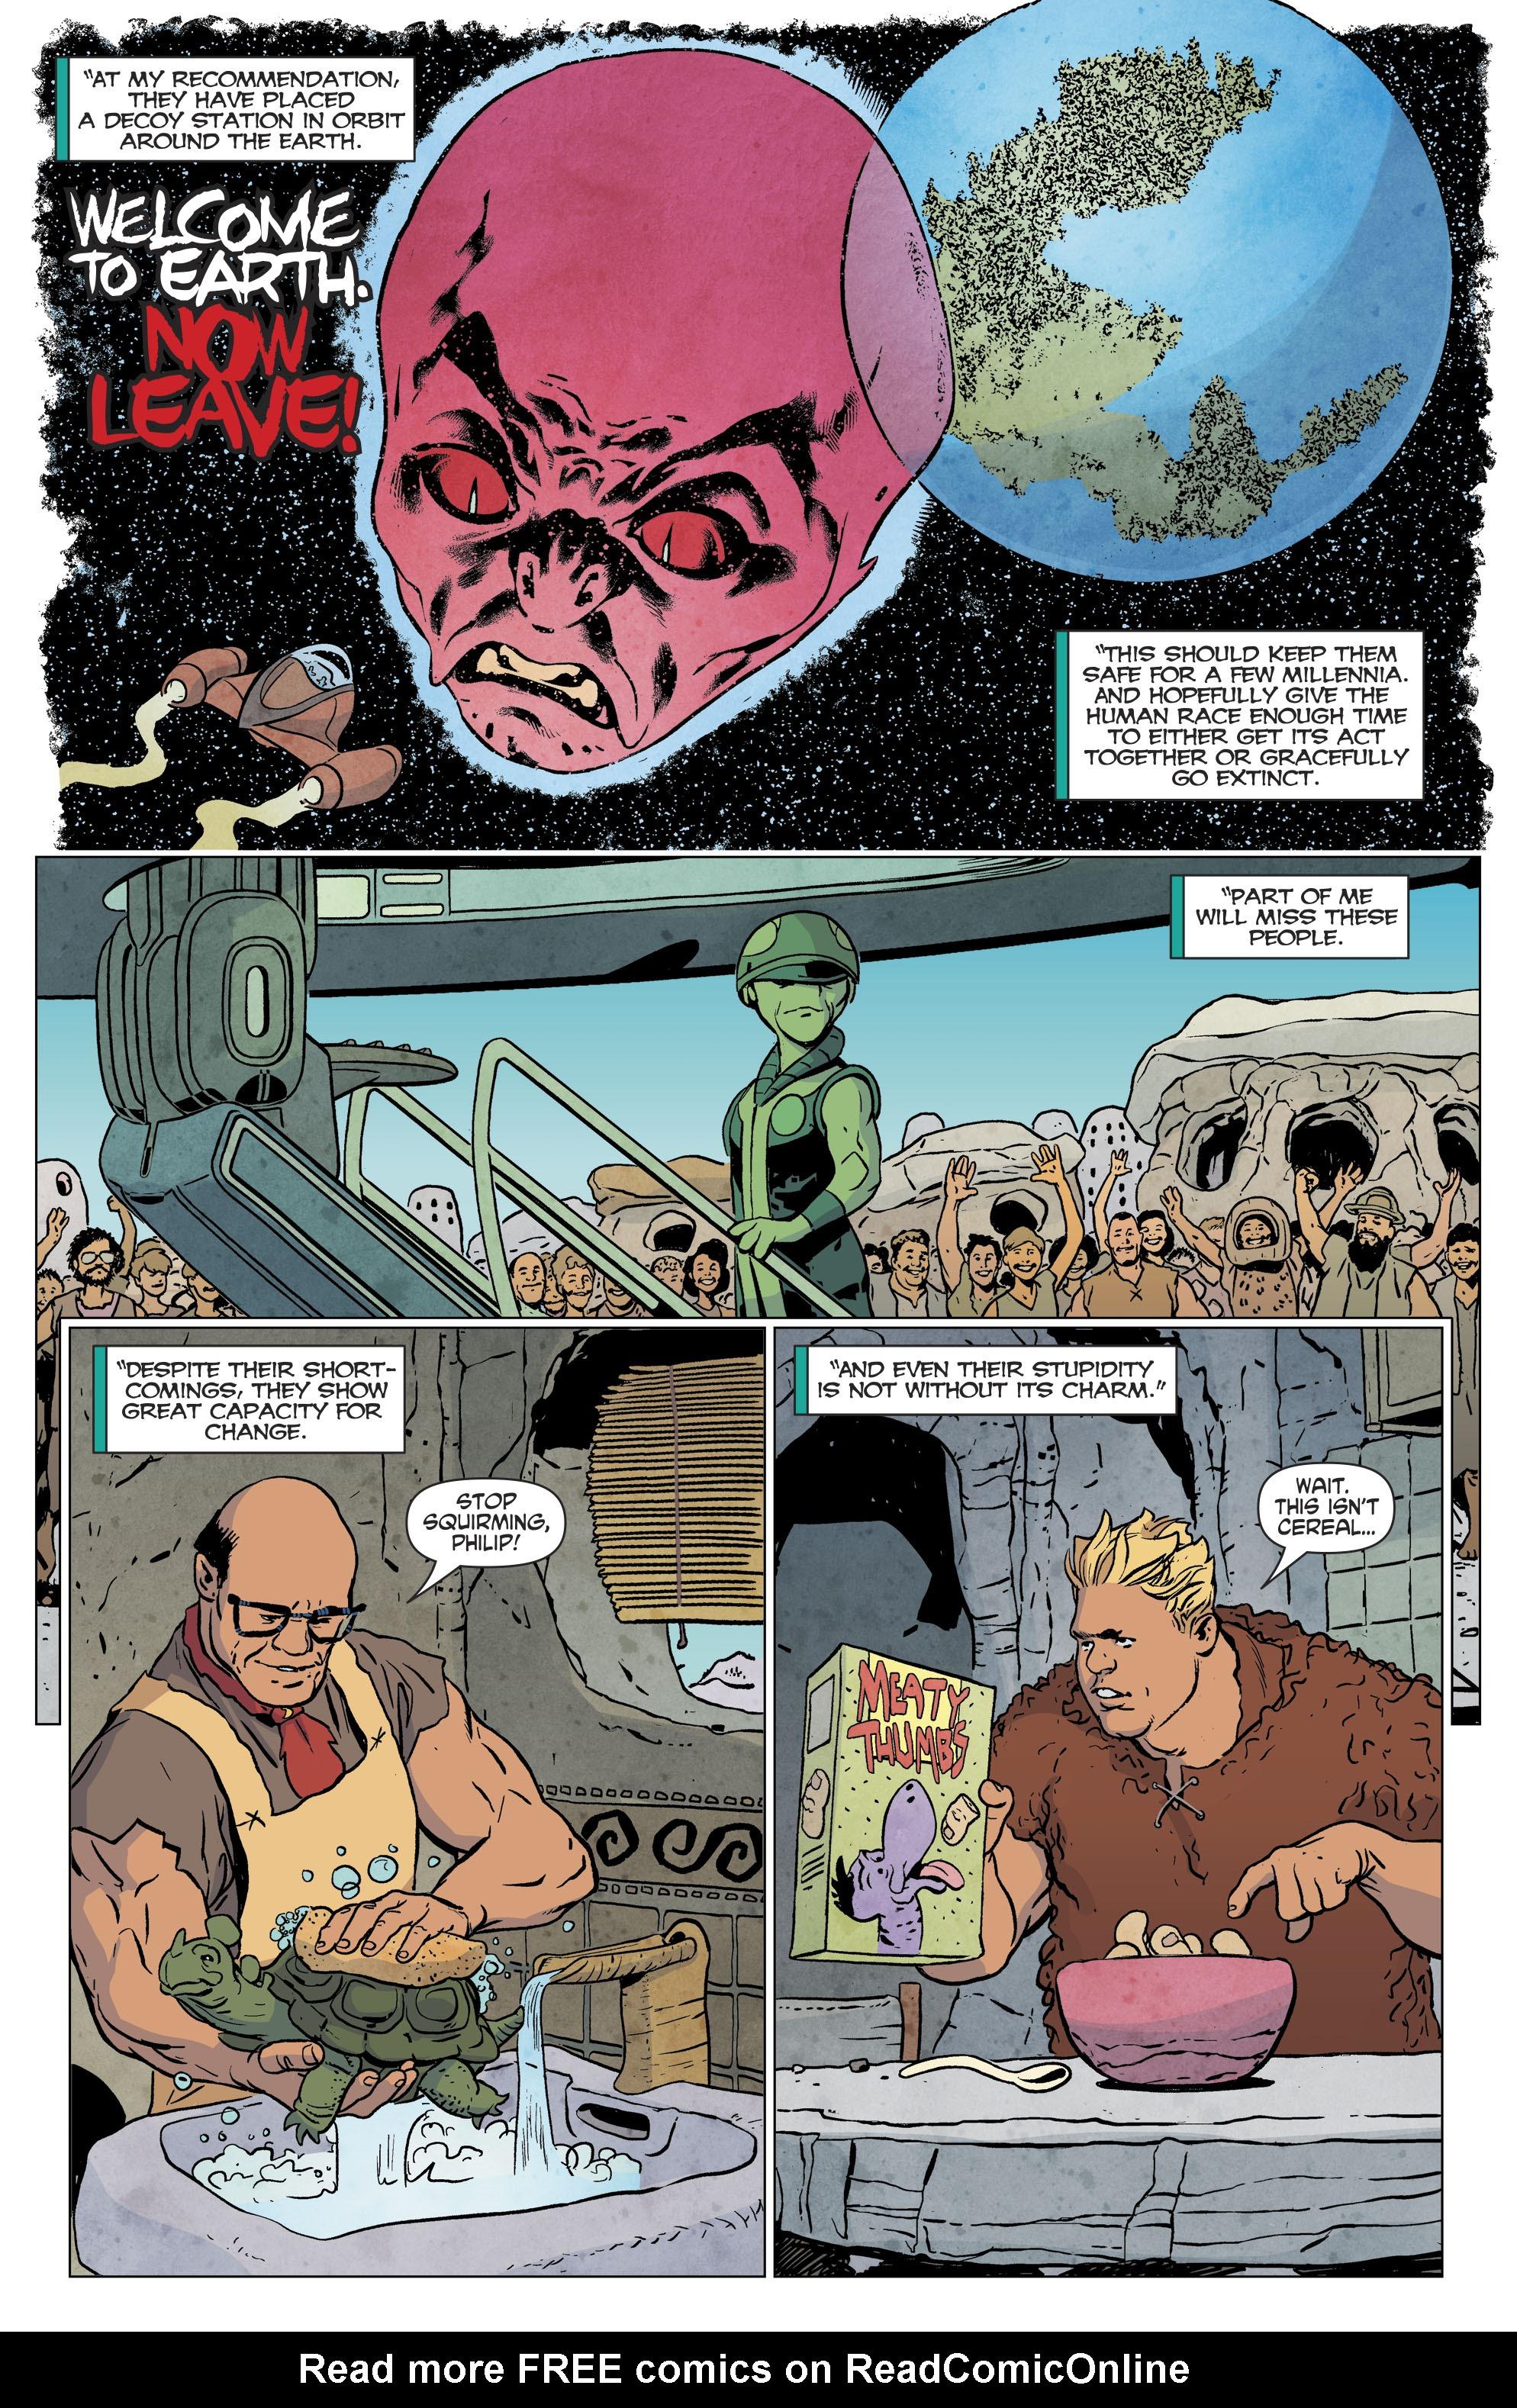 Read online The Flintstones comic -  Issue #12 - 24